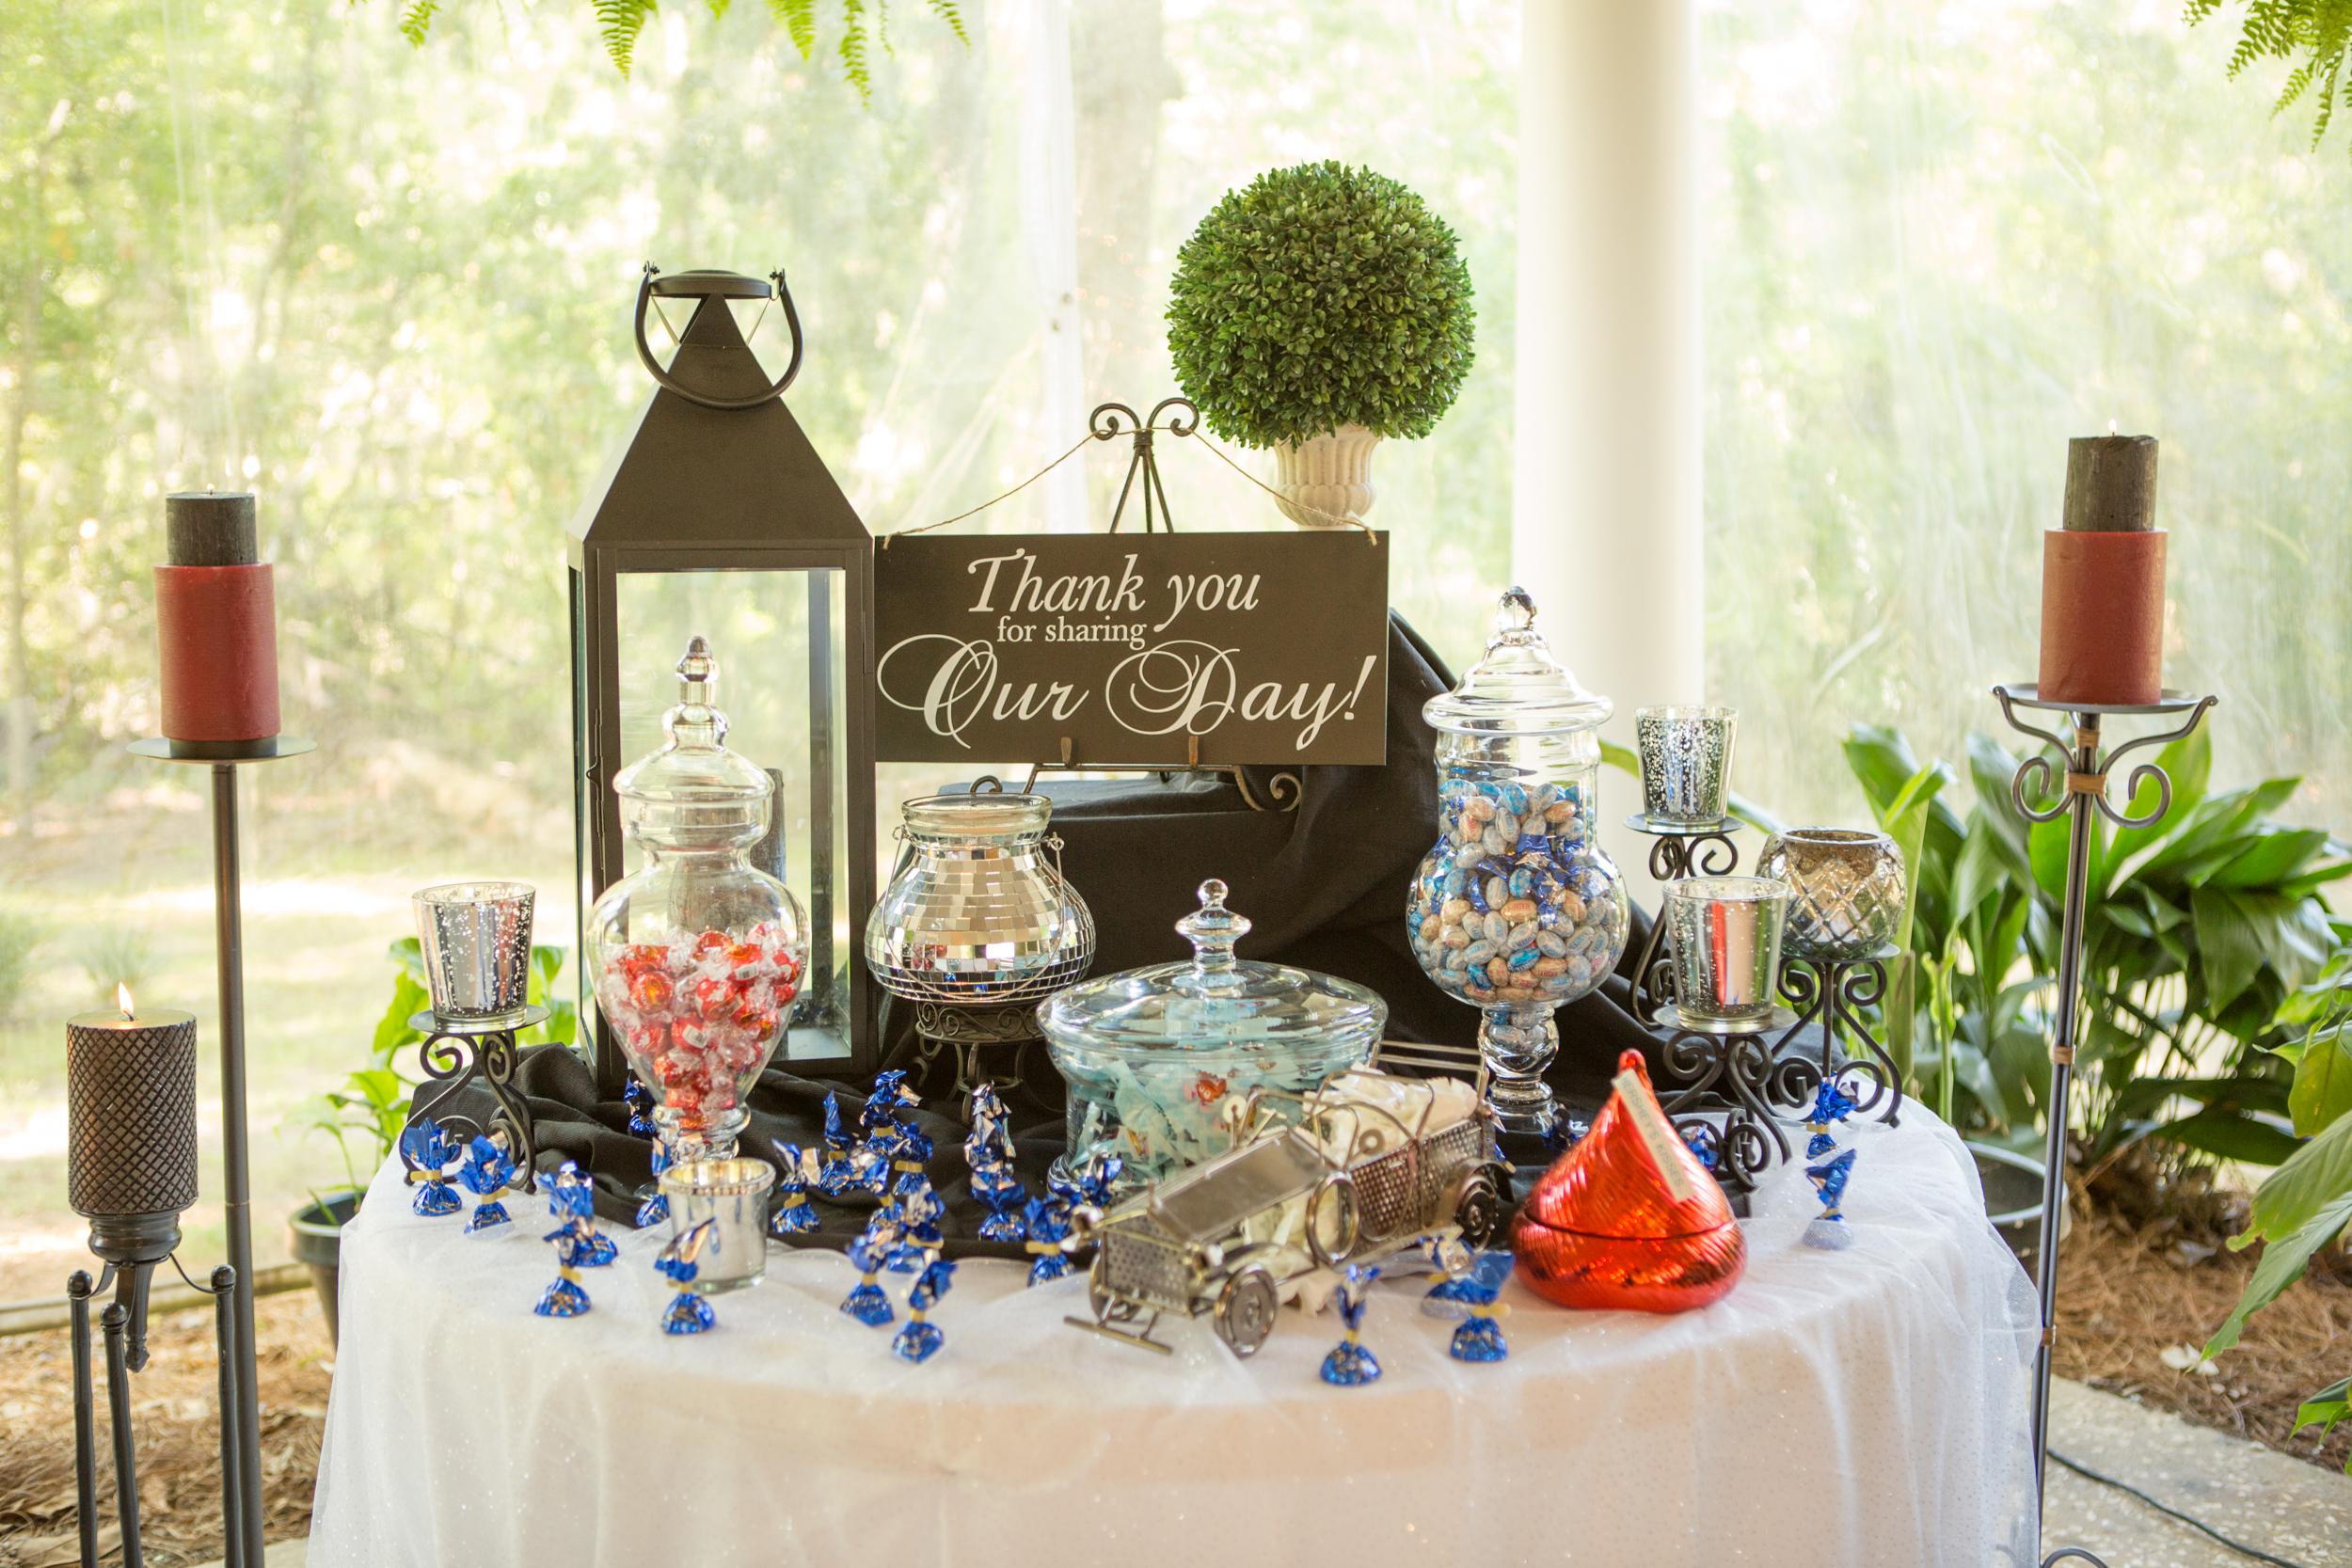 savannah-mackey-house-wedding-14.jpg